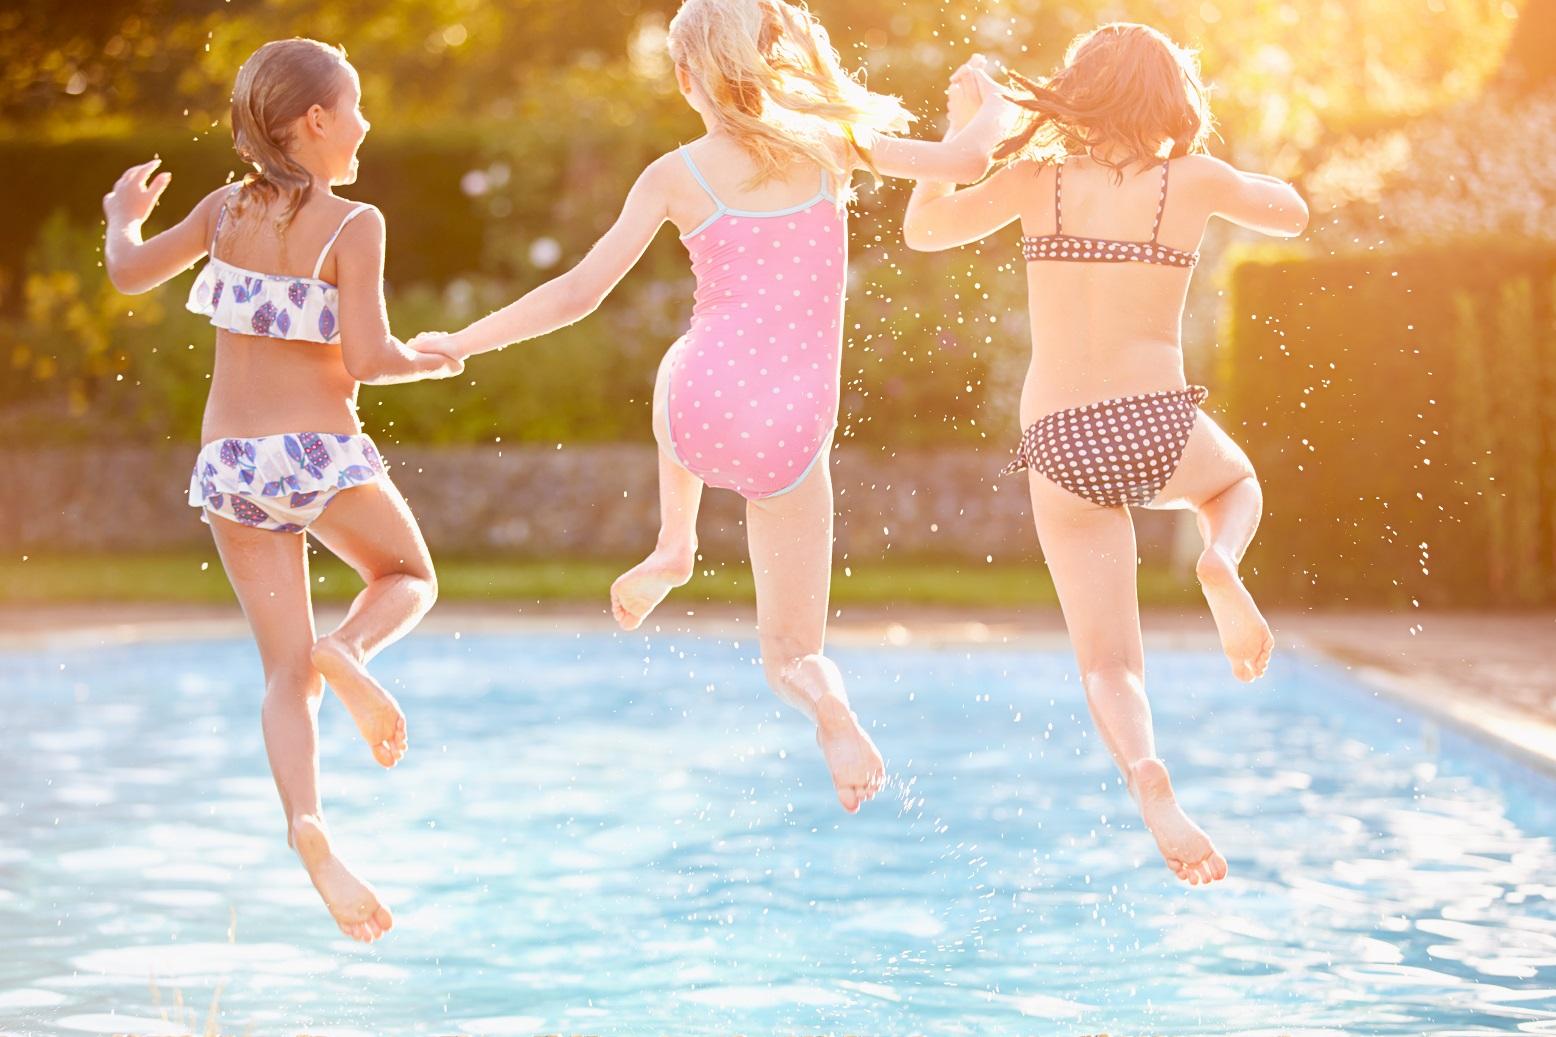 Pool Stock Image Resized.jpg